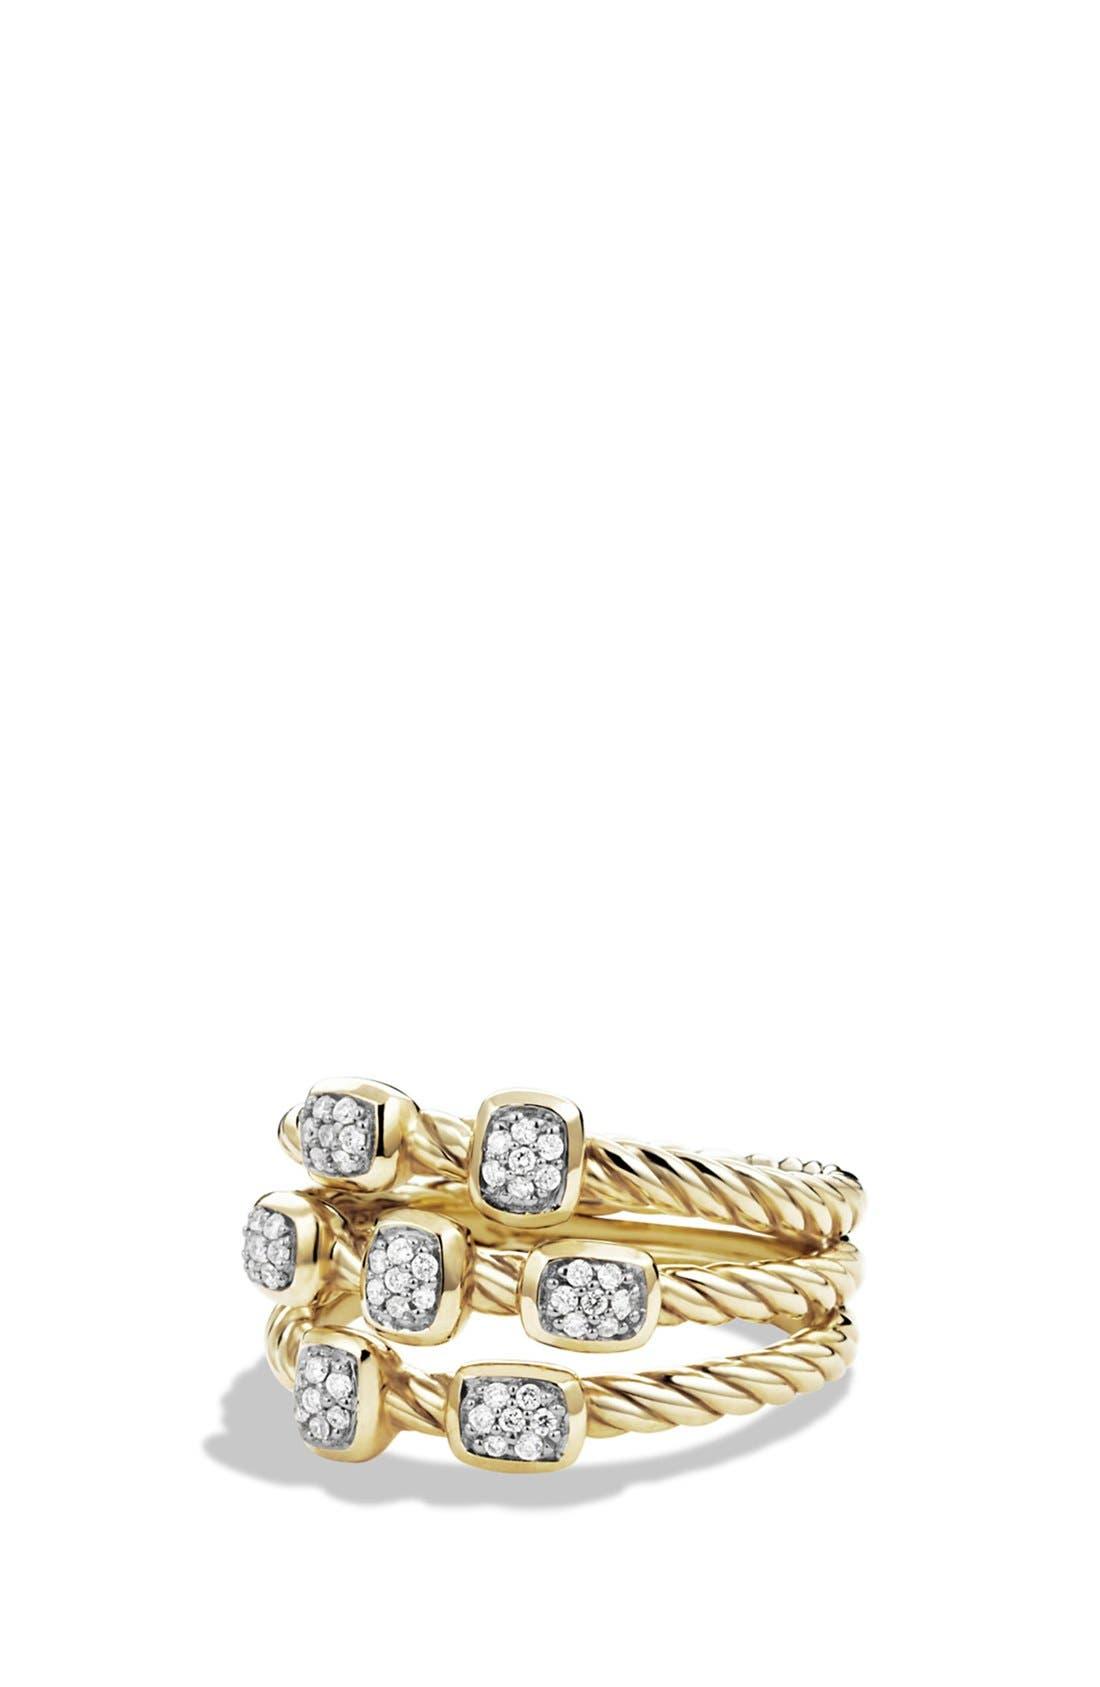 'Confetti' Ring with Diamonds in Gold,                             Main thumbnail 1, color,                             DIAMOND